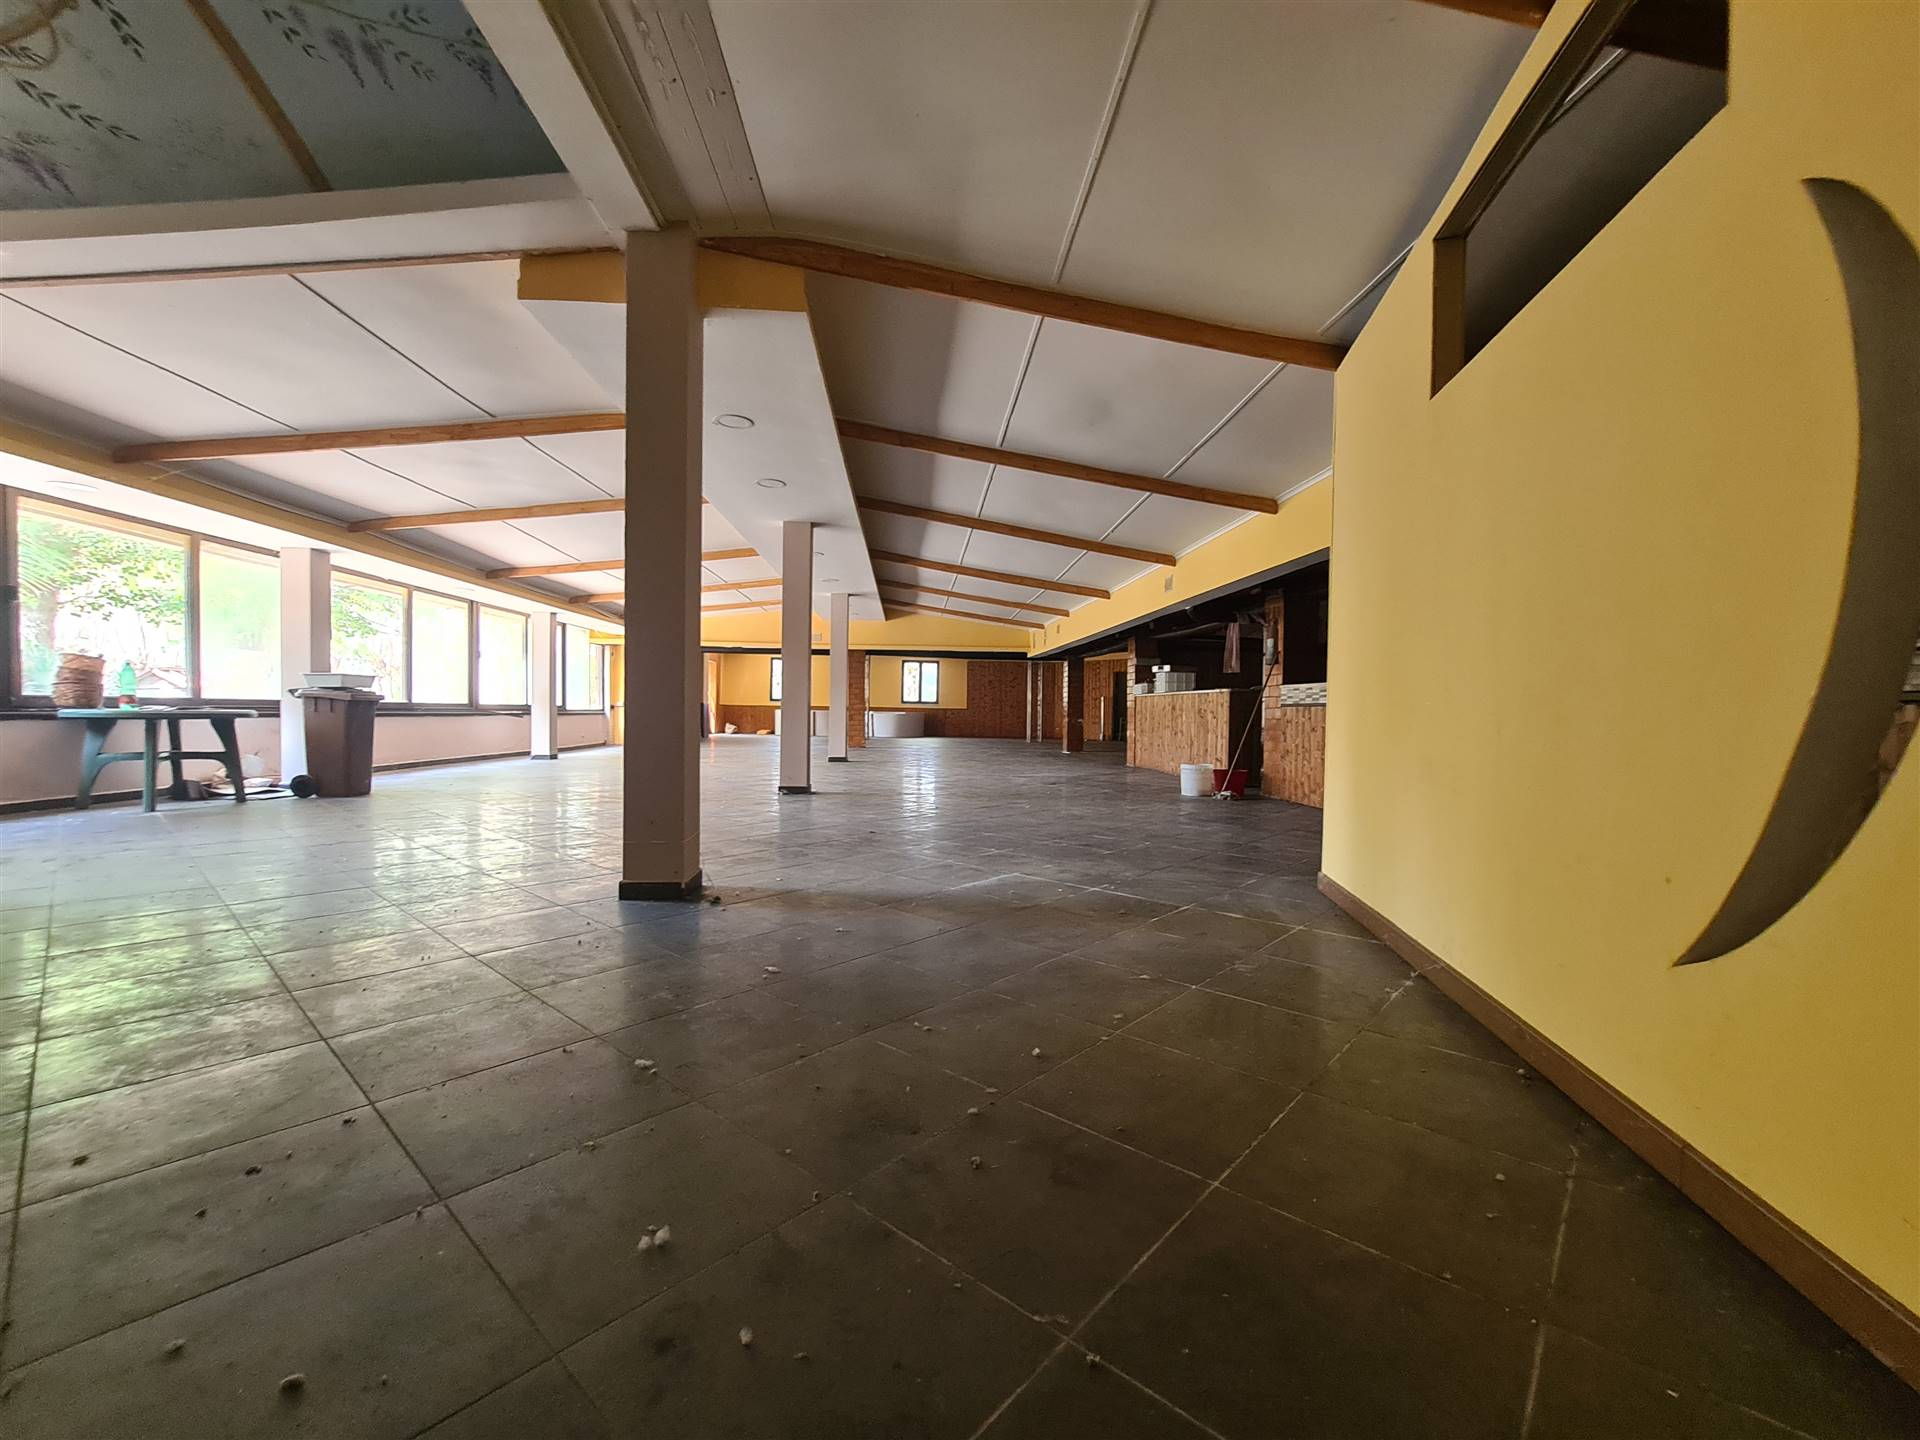 LV044D-Attivita Commerciale-PONTELATONE-Via-Ponte-Pellegrino